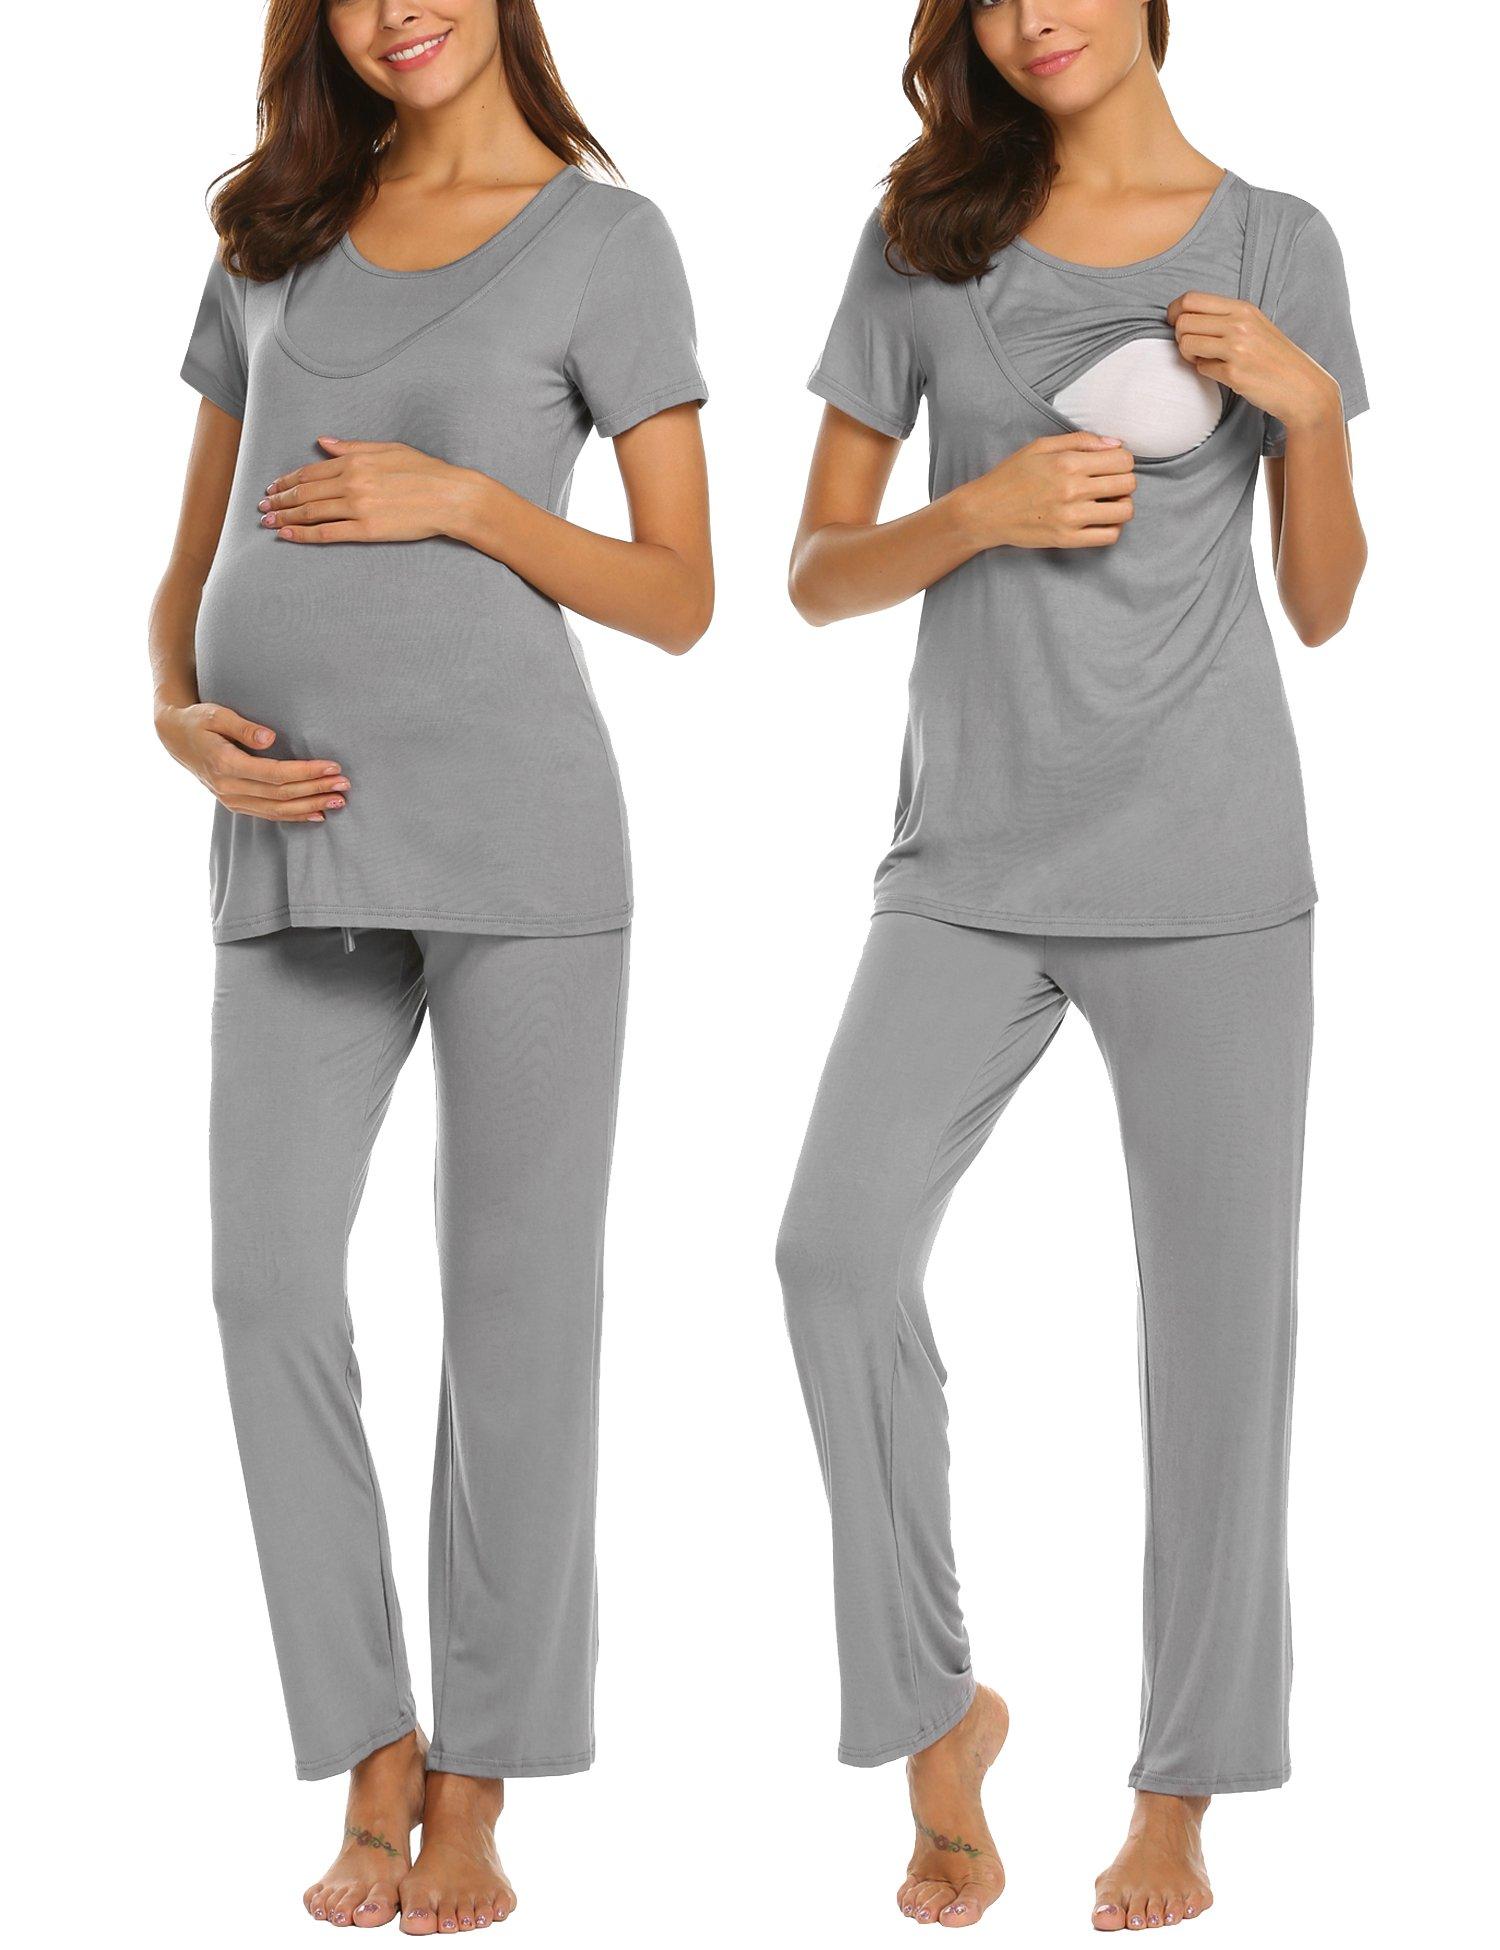 MAXMODA Woman Cotton Nursing Sleep Set for Breastfeeding Short Sleeve